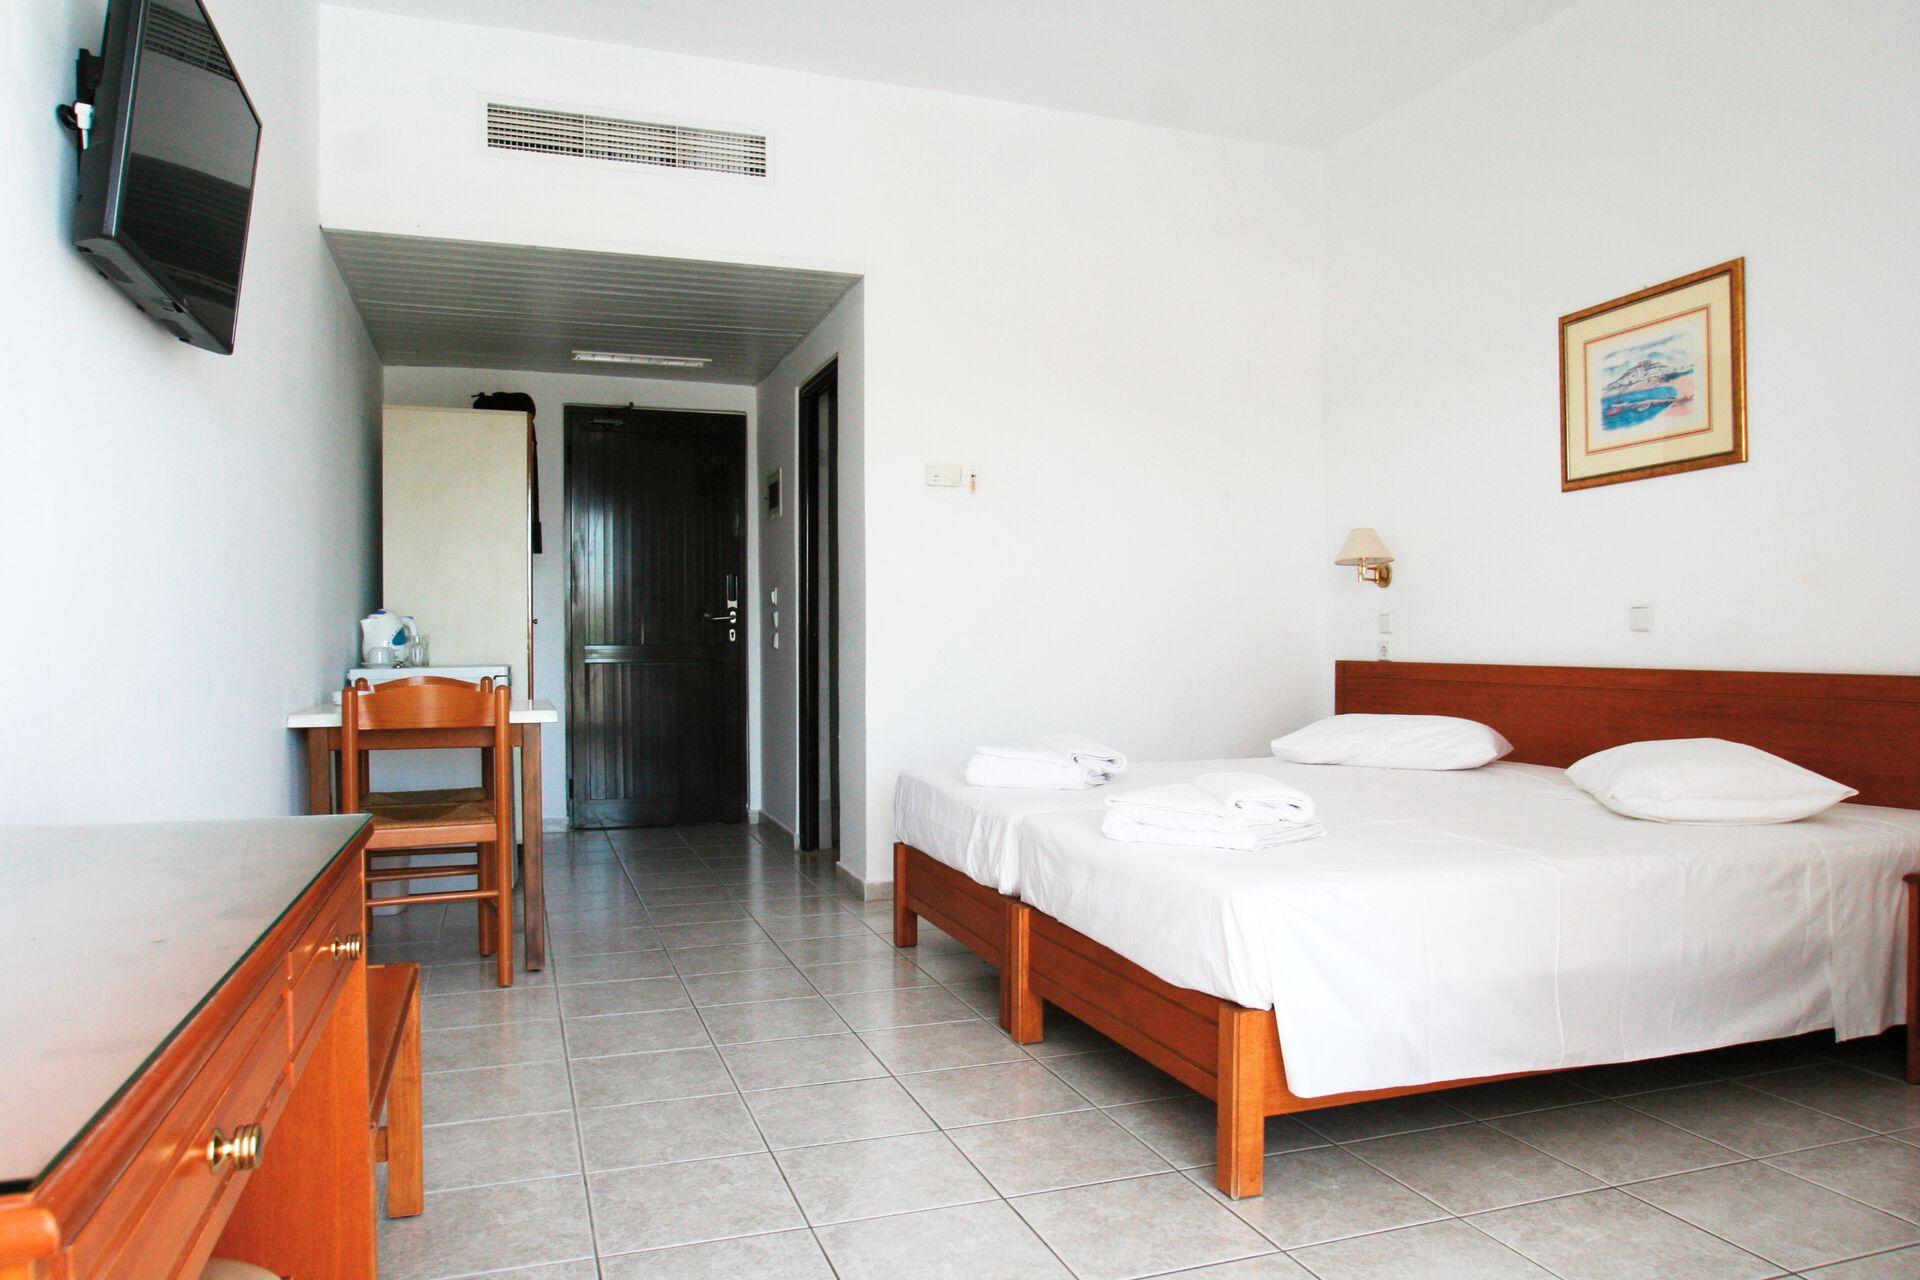 Séjour Iles du Dodécanèse - Orion Hotel - 3*